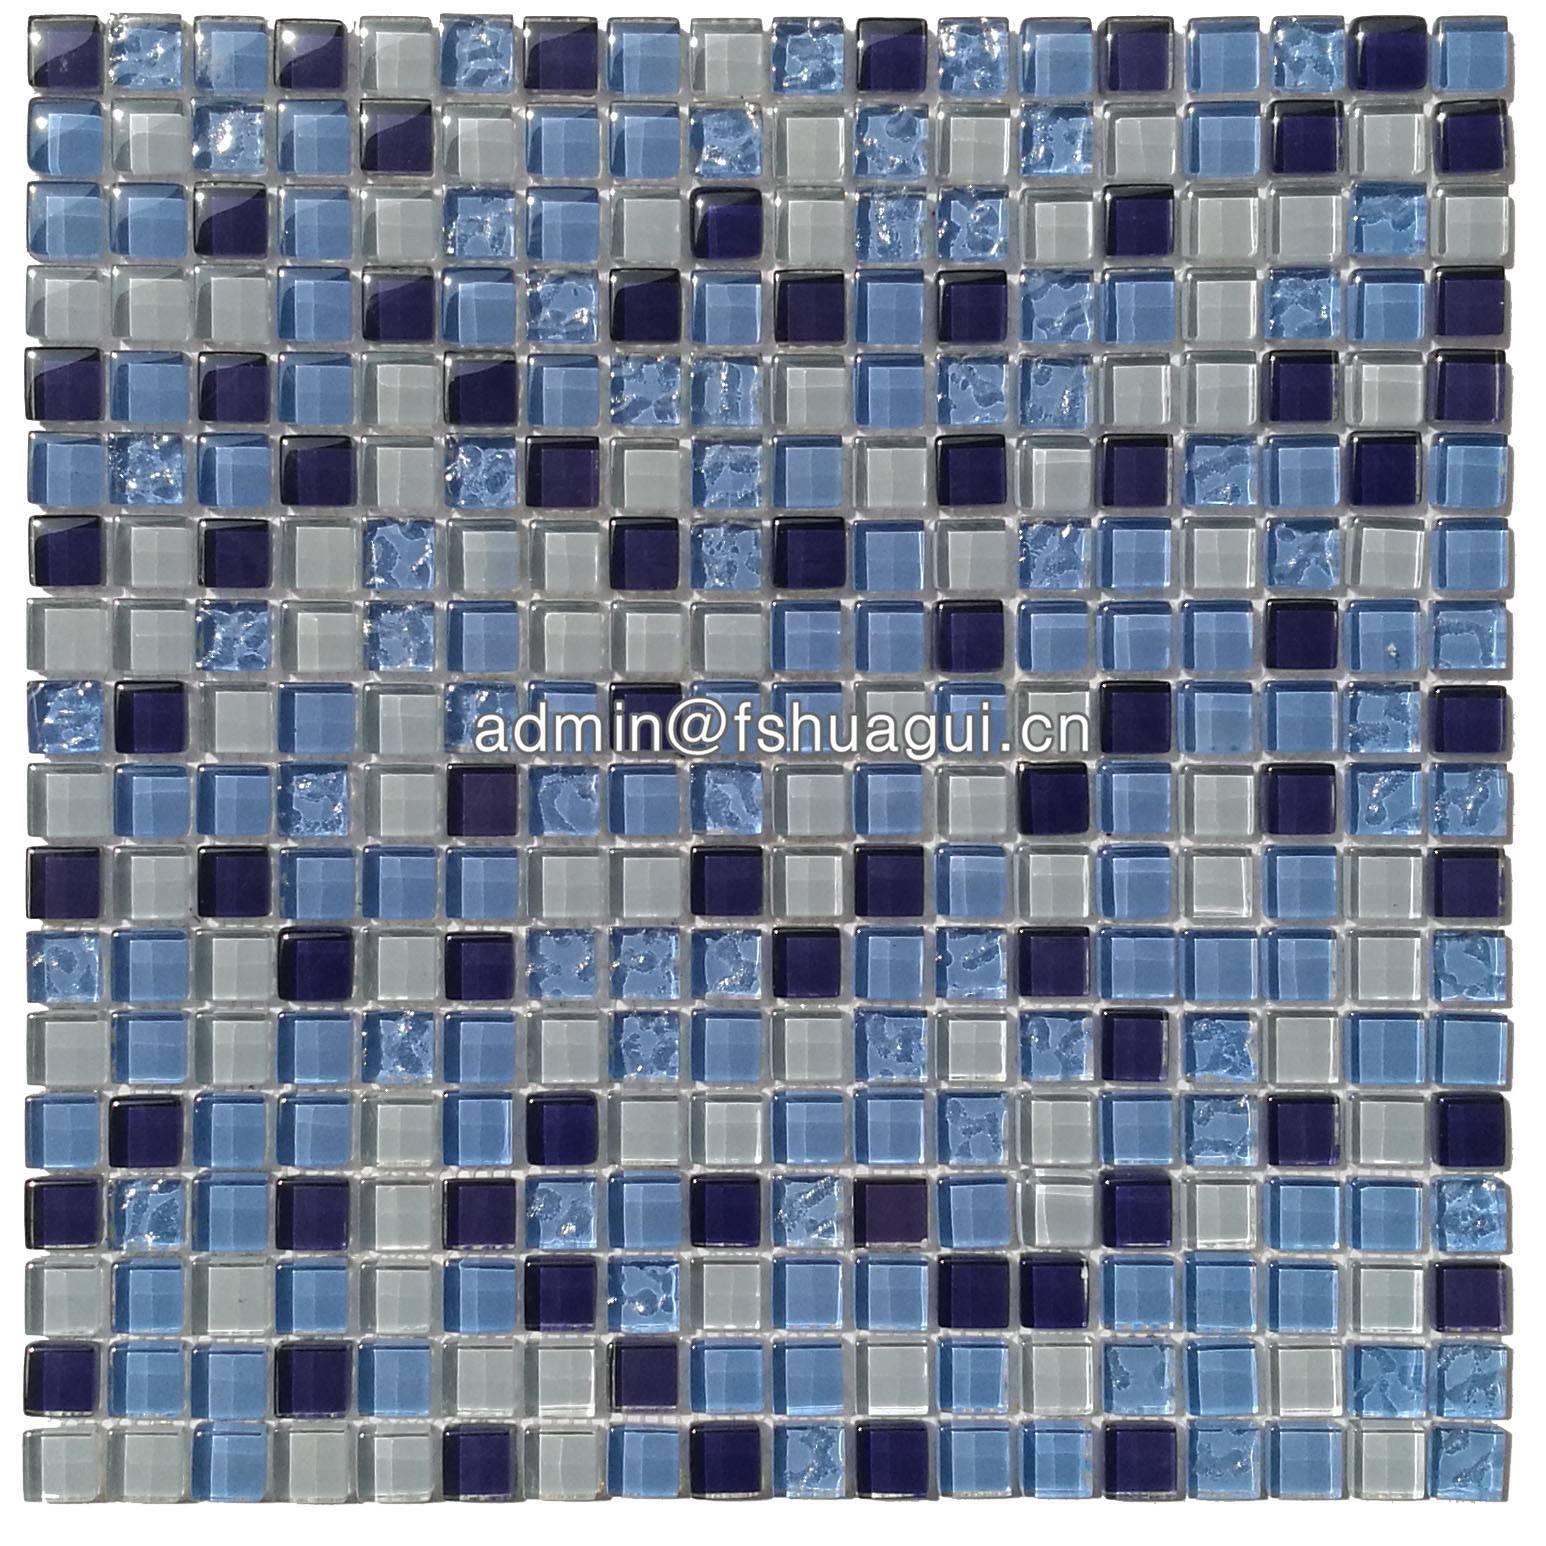 Huagui Crystal glass Blue glass mosaic HG-815002 GLASS MOSAIC TILE image8